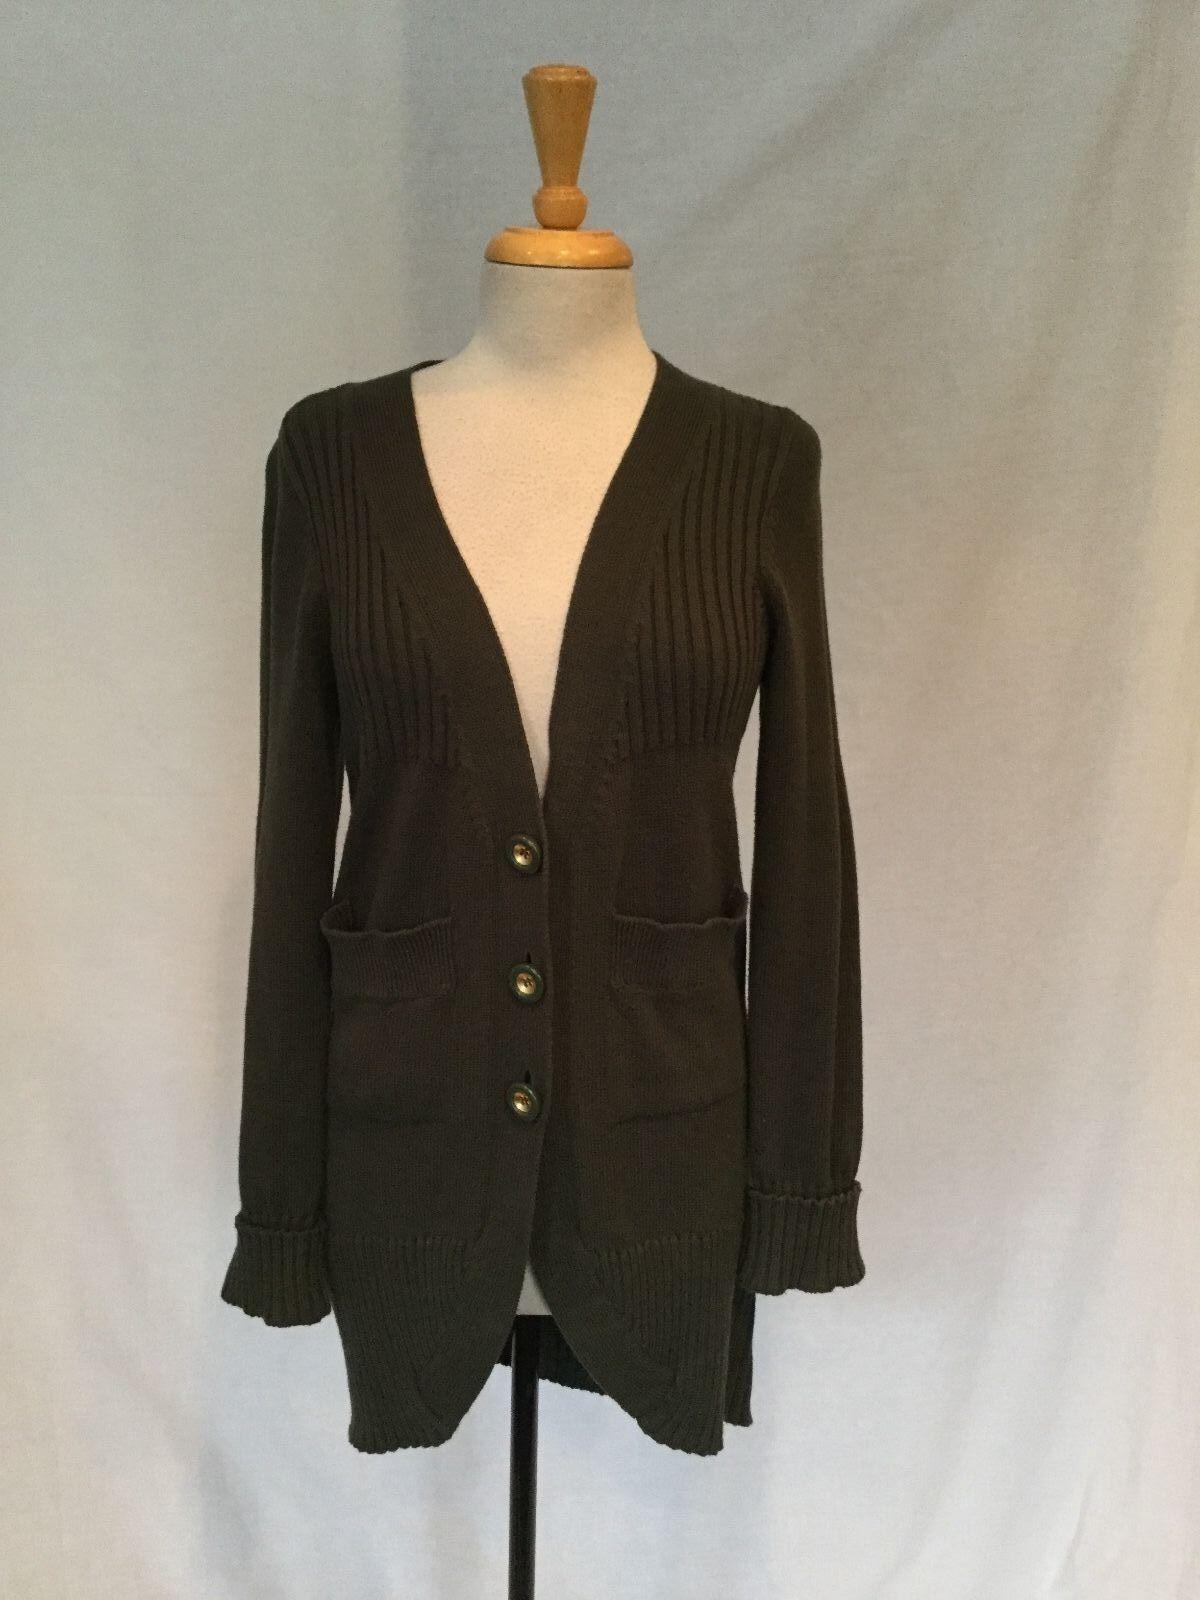 Leifsdottir - Women's Dark Green Cotton & Cashmere  Cardigan - Size Medium